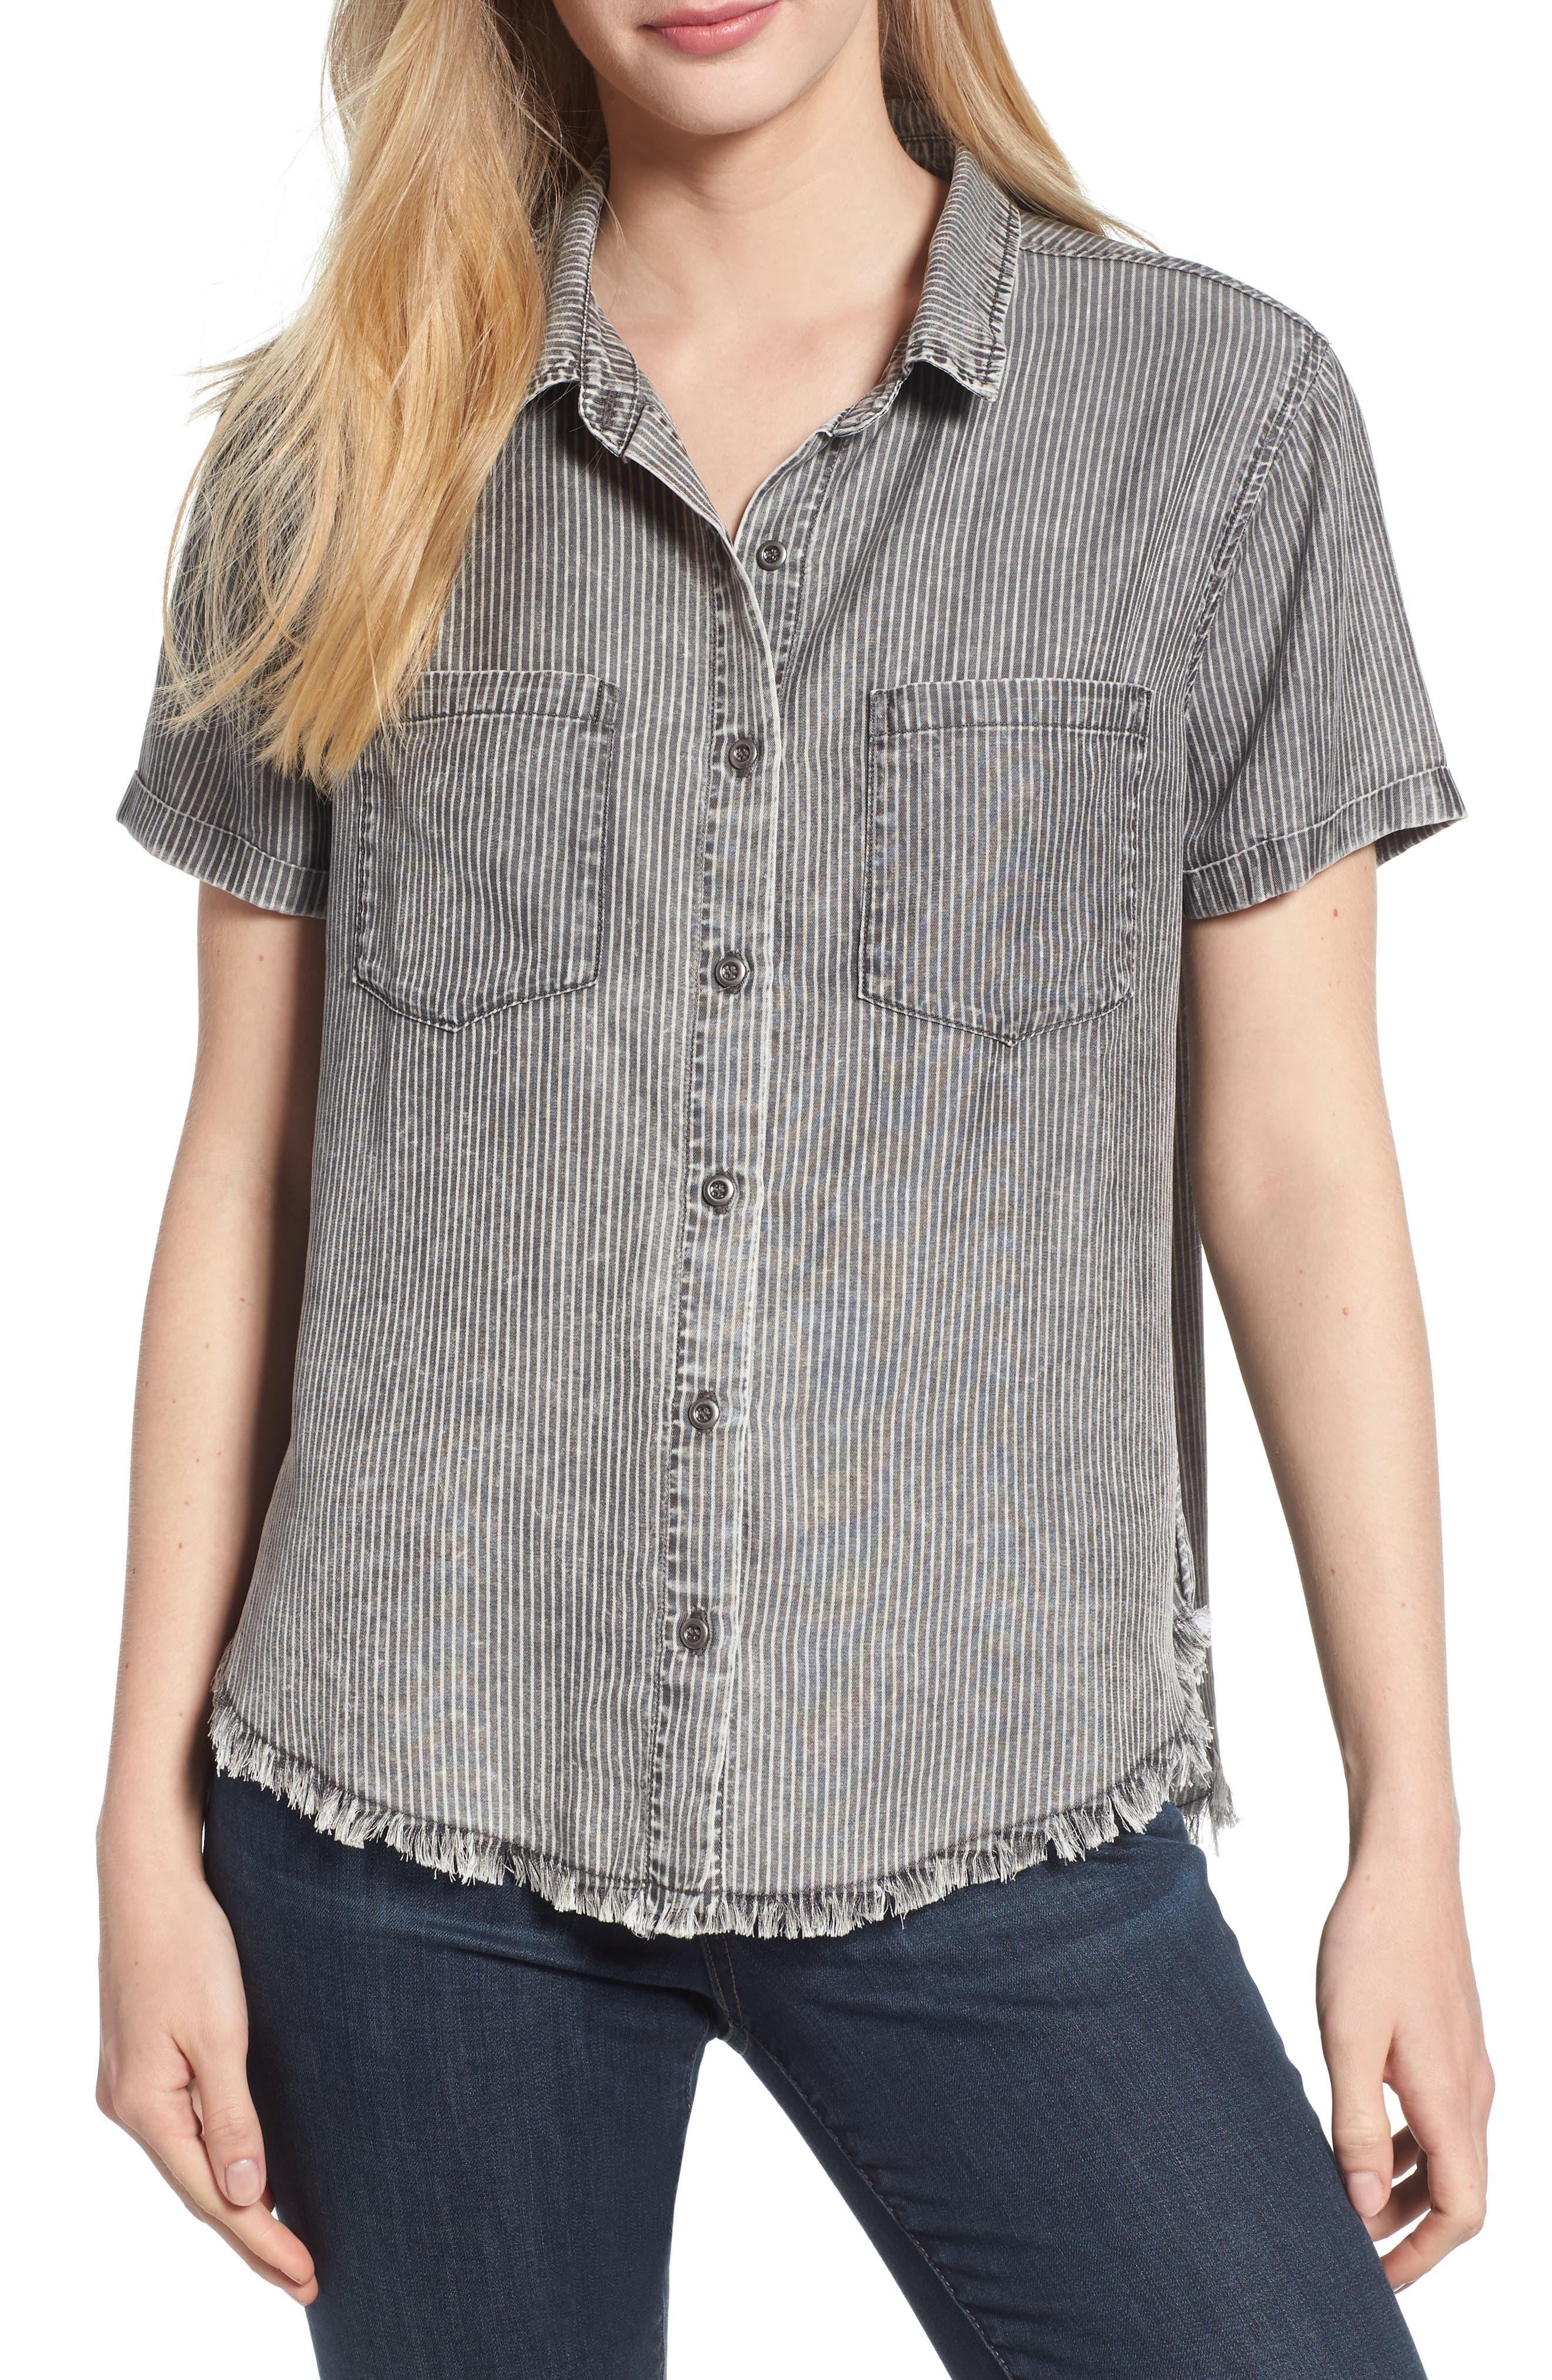 Ticking Stripe Shirt,                             Main thumbnail 1, color,                             Grey Rr